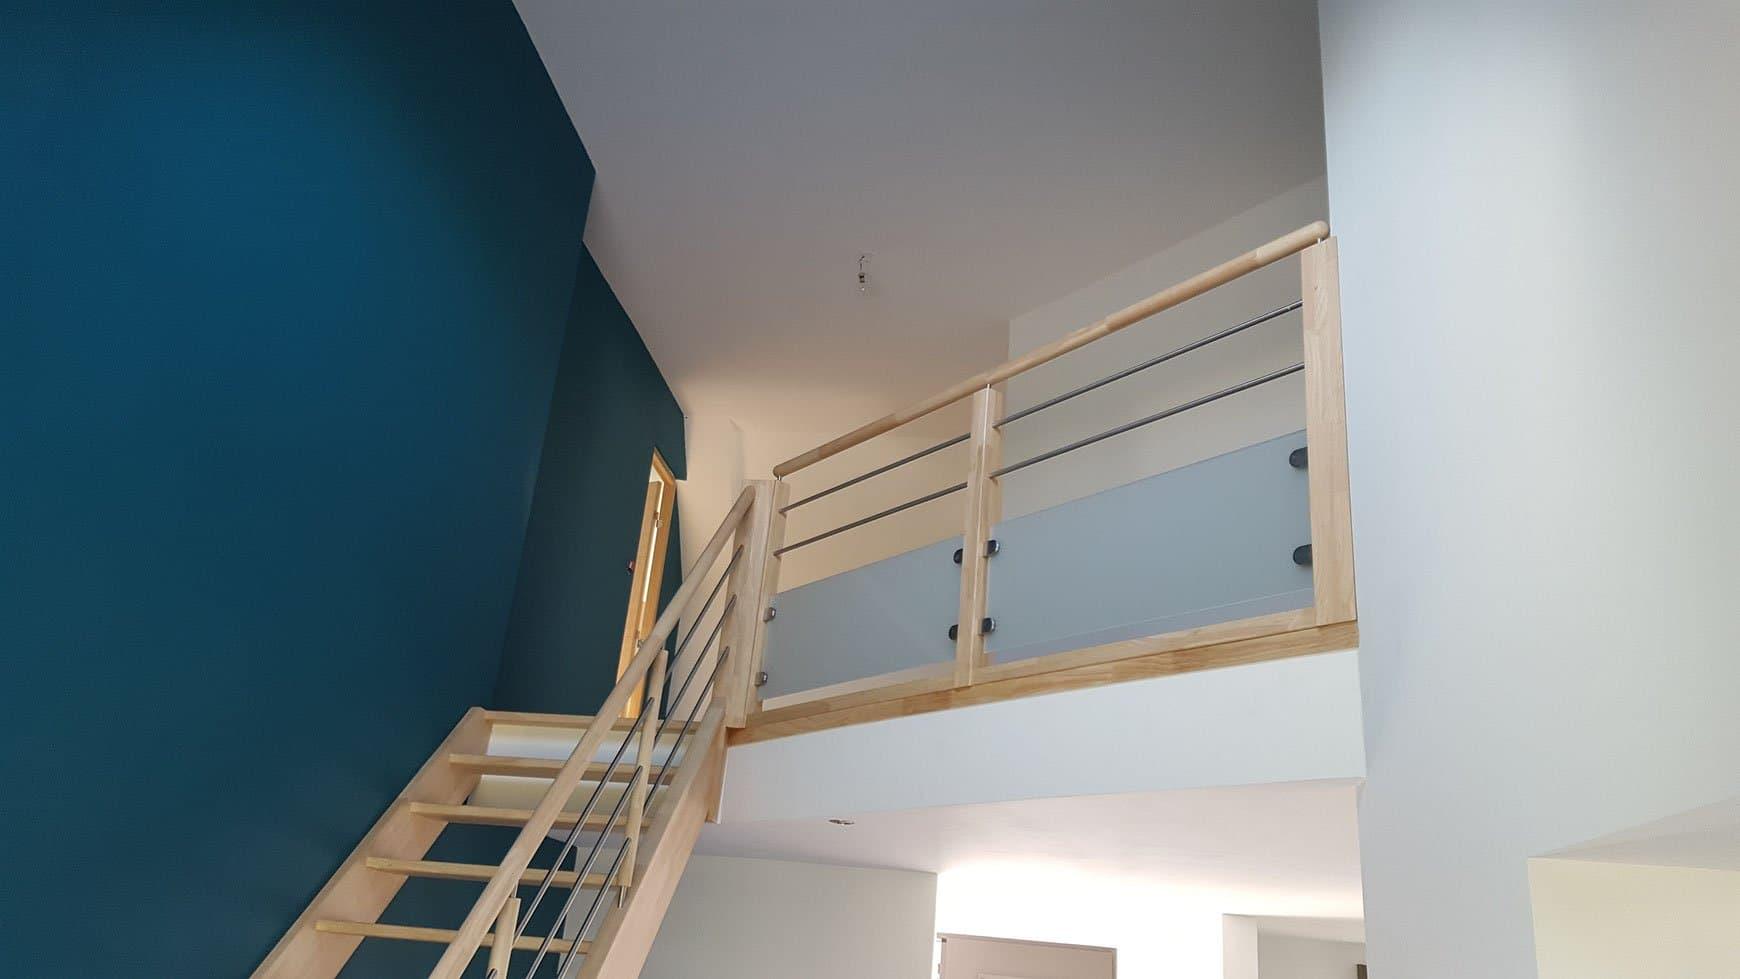 rampe escalier plexiglass yu73 jornalagora. Black Bedroom Furniture Sets. Home Design Ideas